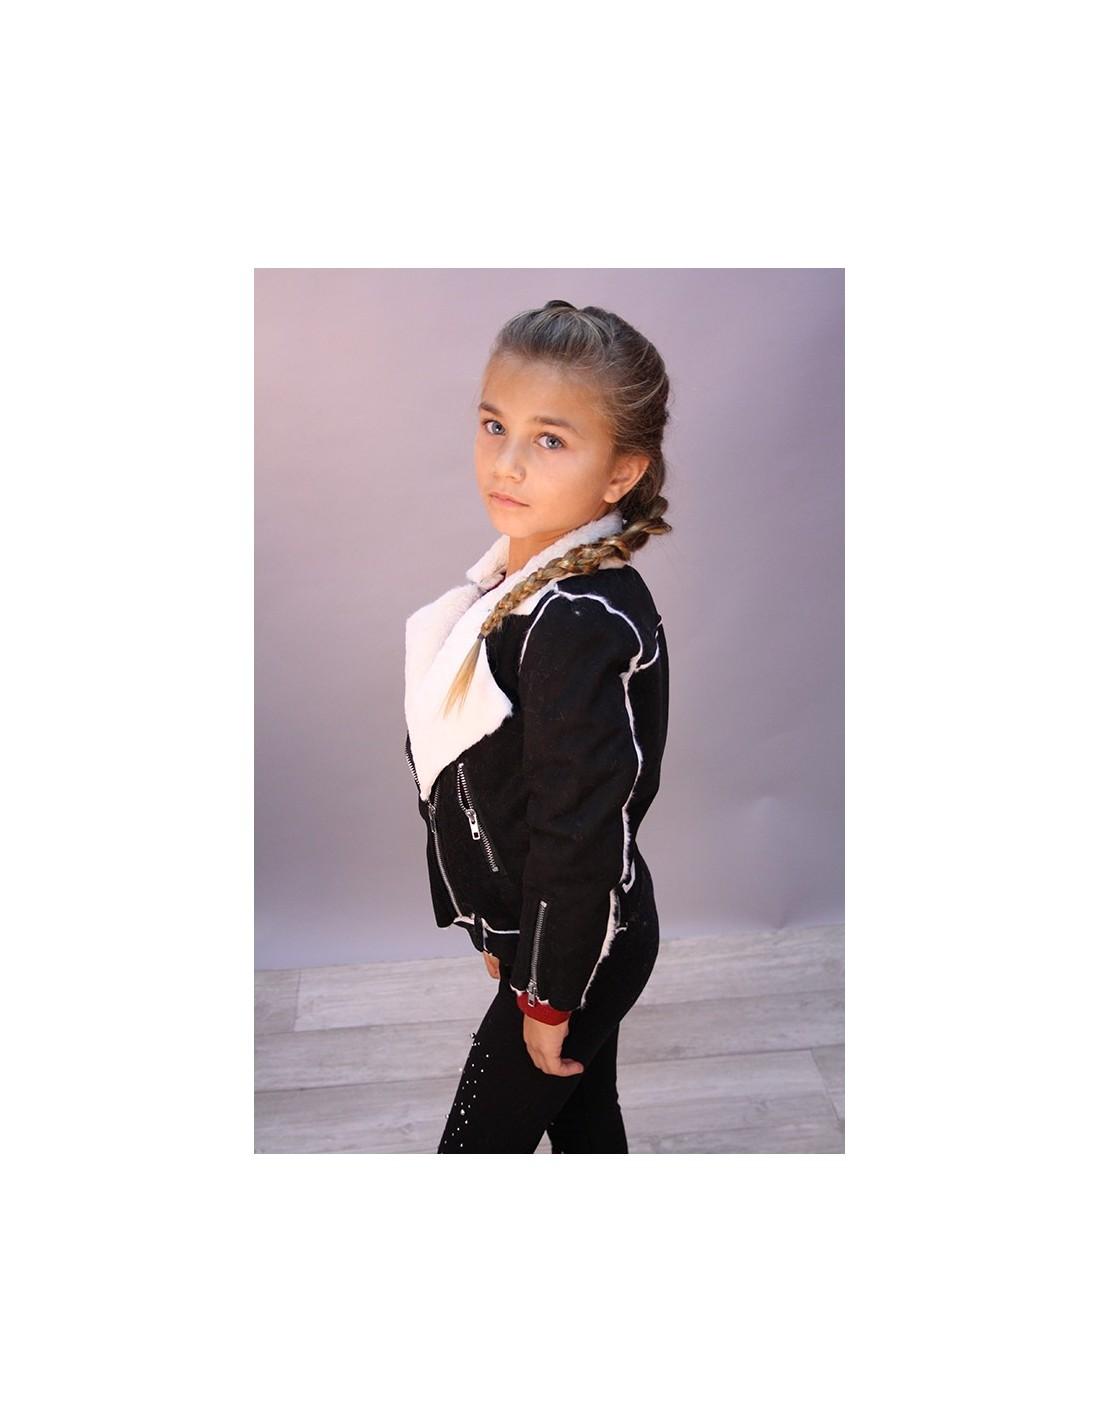 Tendance mode fille 12 ans